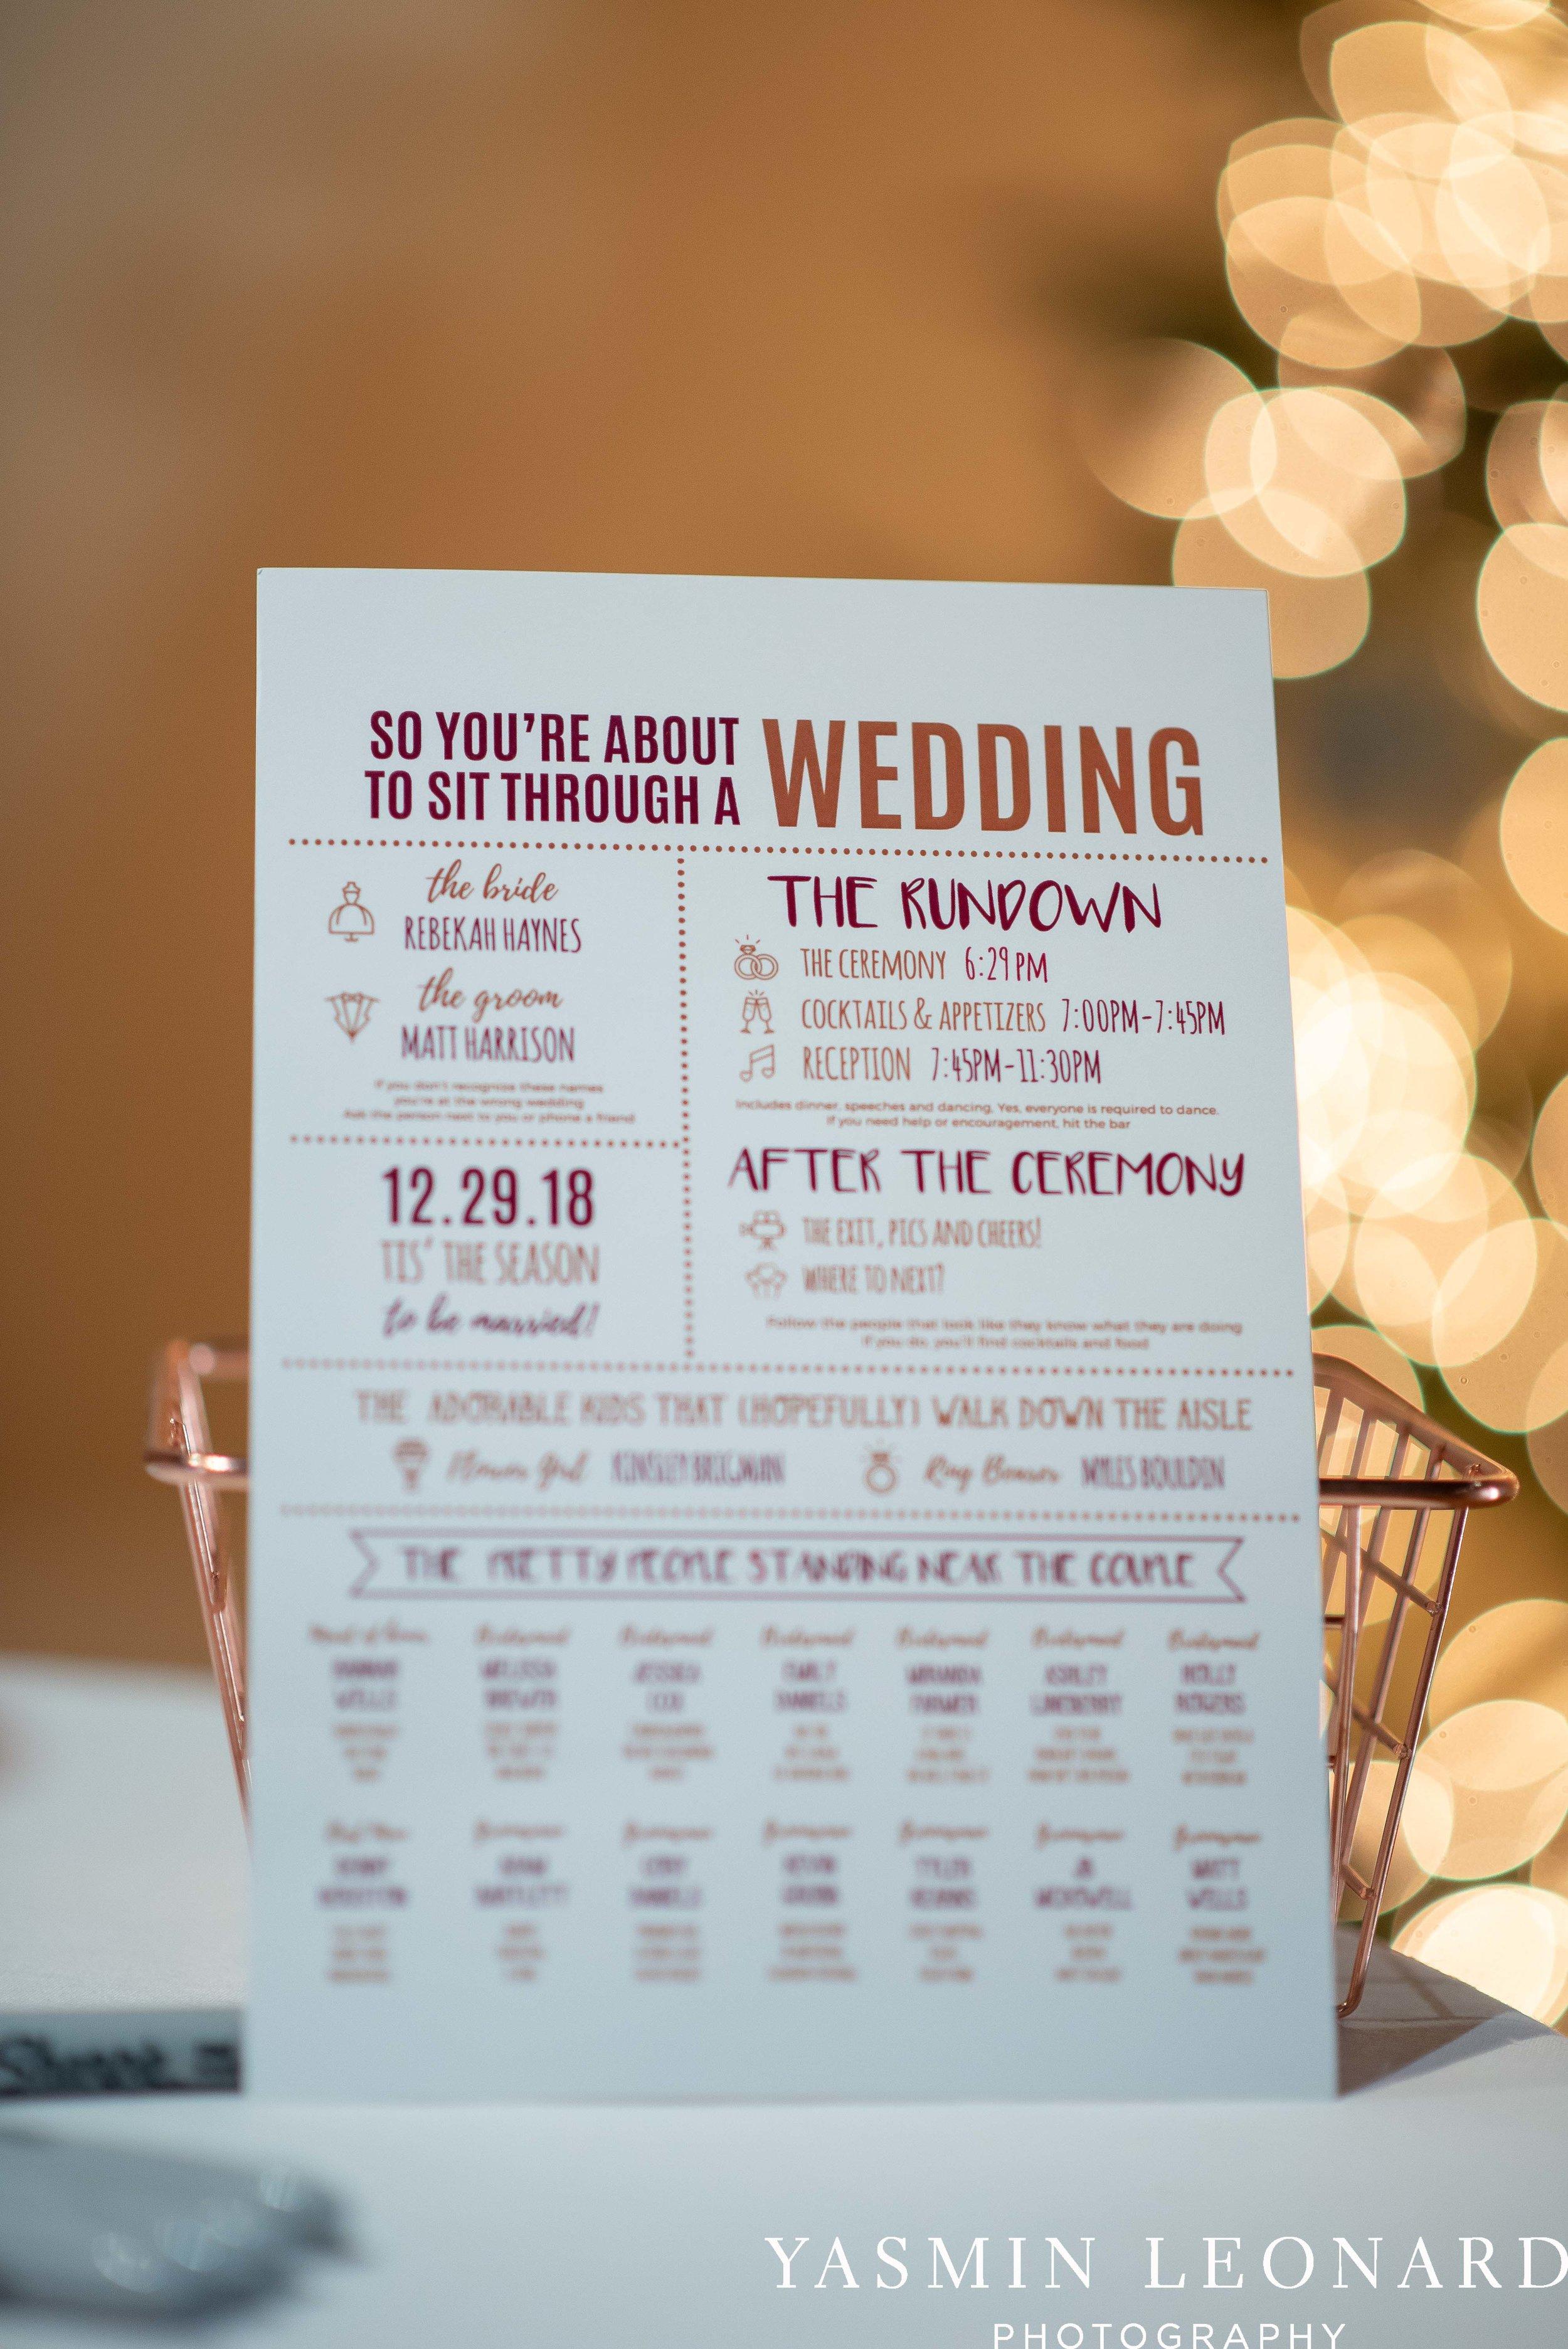 Rebekah and Matt - 105 Worth Event Centre - Yasmin Leonard Photography - Asheboro Wedding - NC Wedding - High Point Weddings - Triad Weddings - Winter Wedding-4.jpg